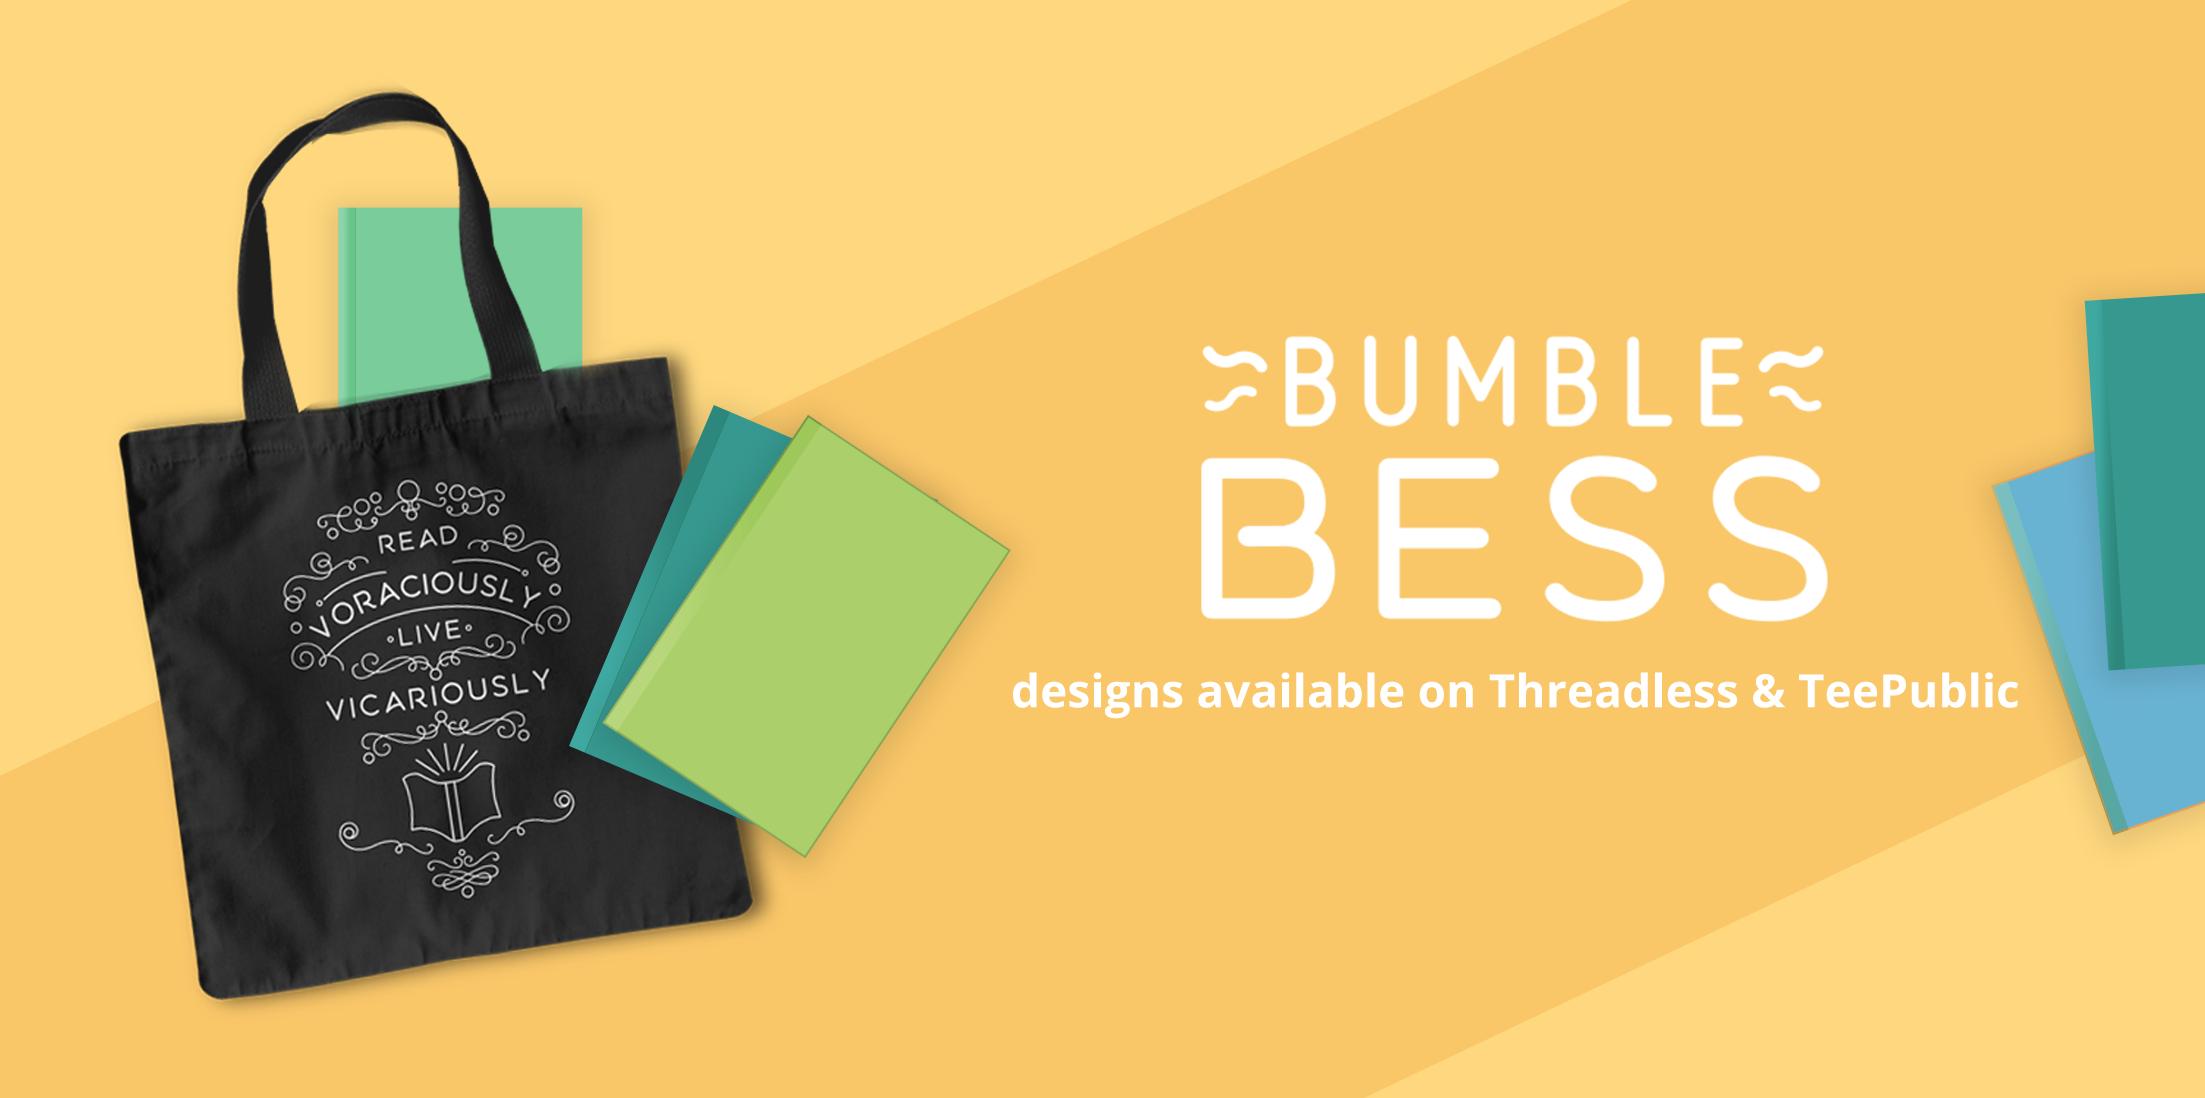 BumbleBess: designs available on Threadless.com & TeePublic.com